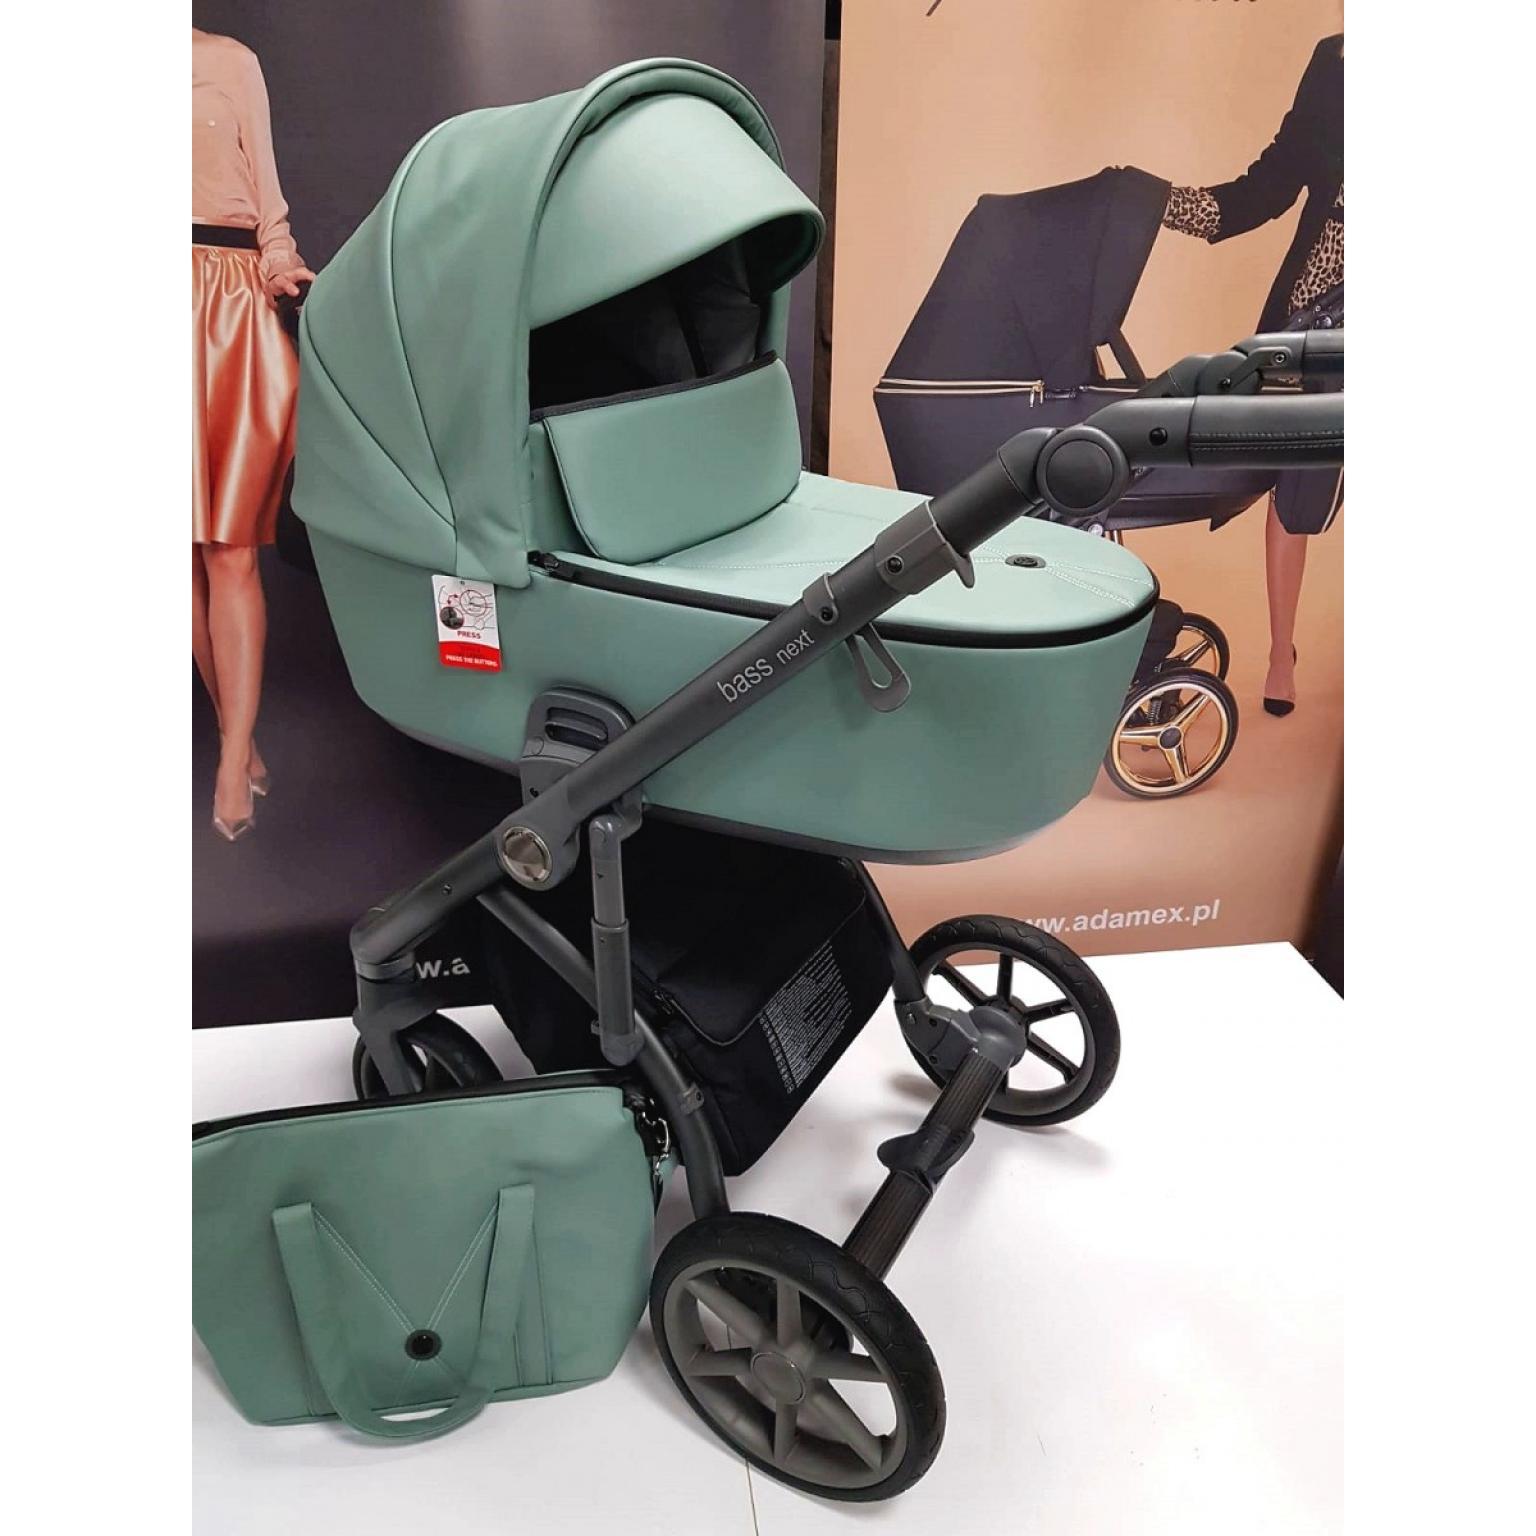 Bērnu-rati-ROAN-BASS-NEXT-ECO-ĀDA-Mint-детская-коляска